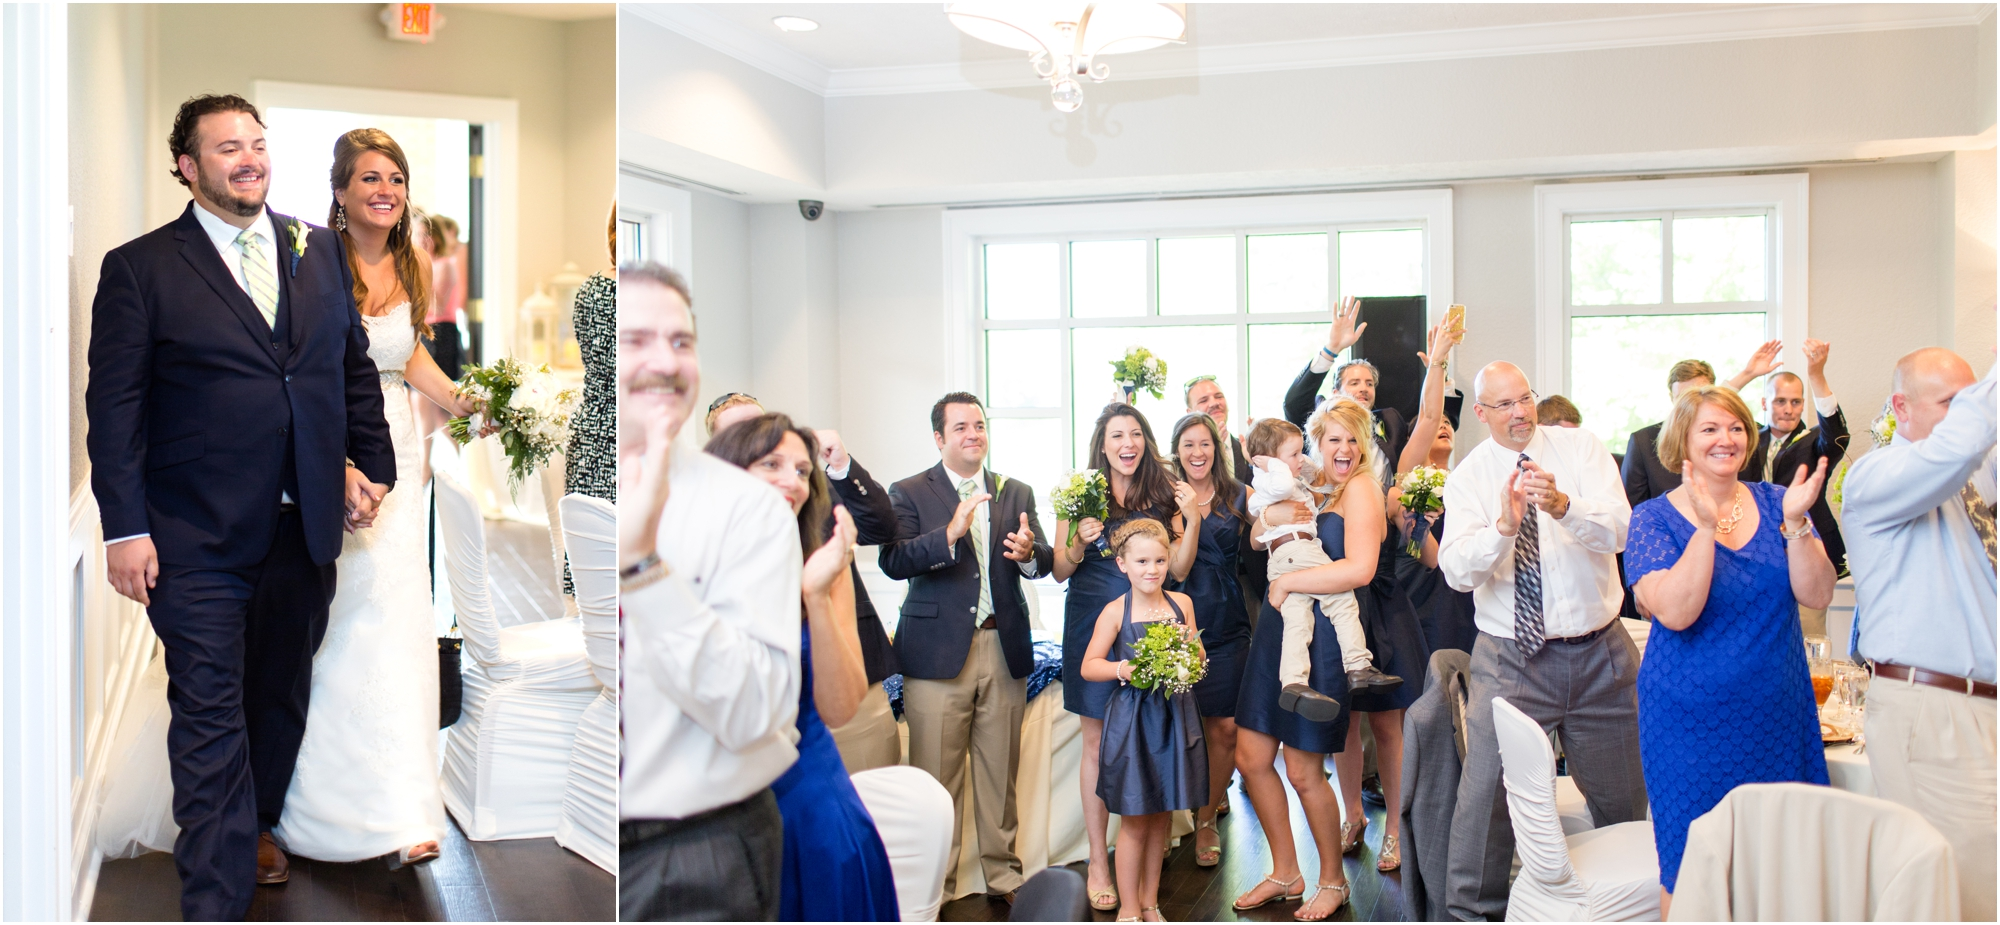 6-Barto Wedding Reception-920.jpg